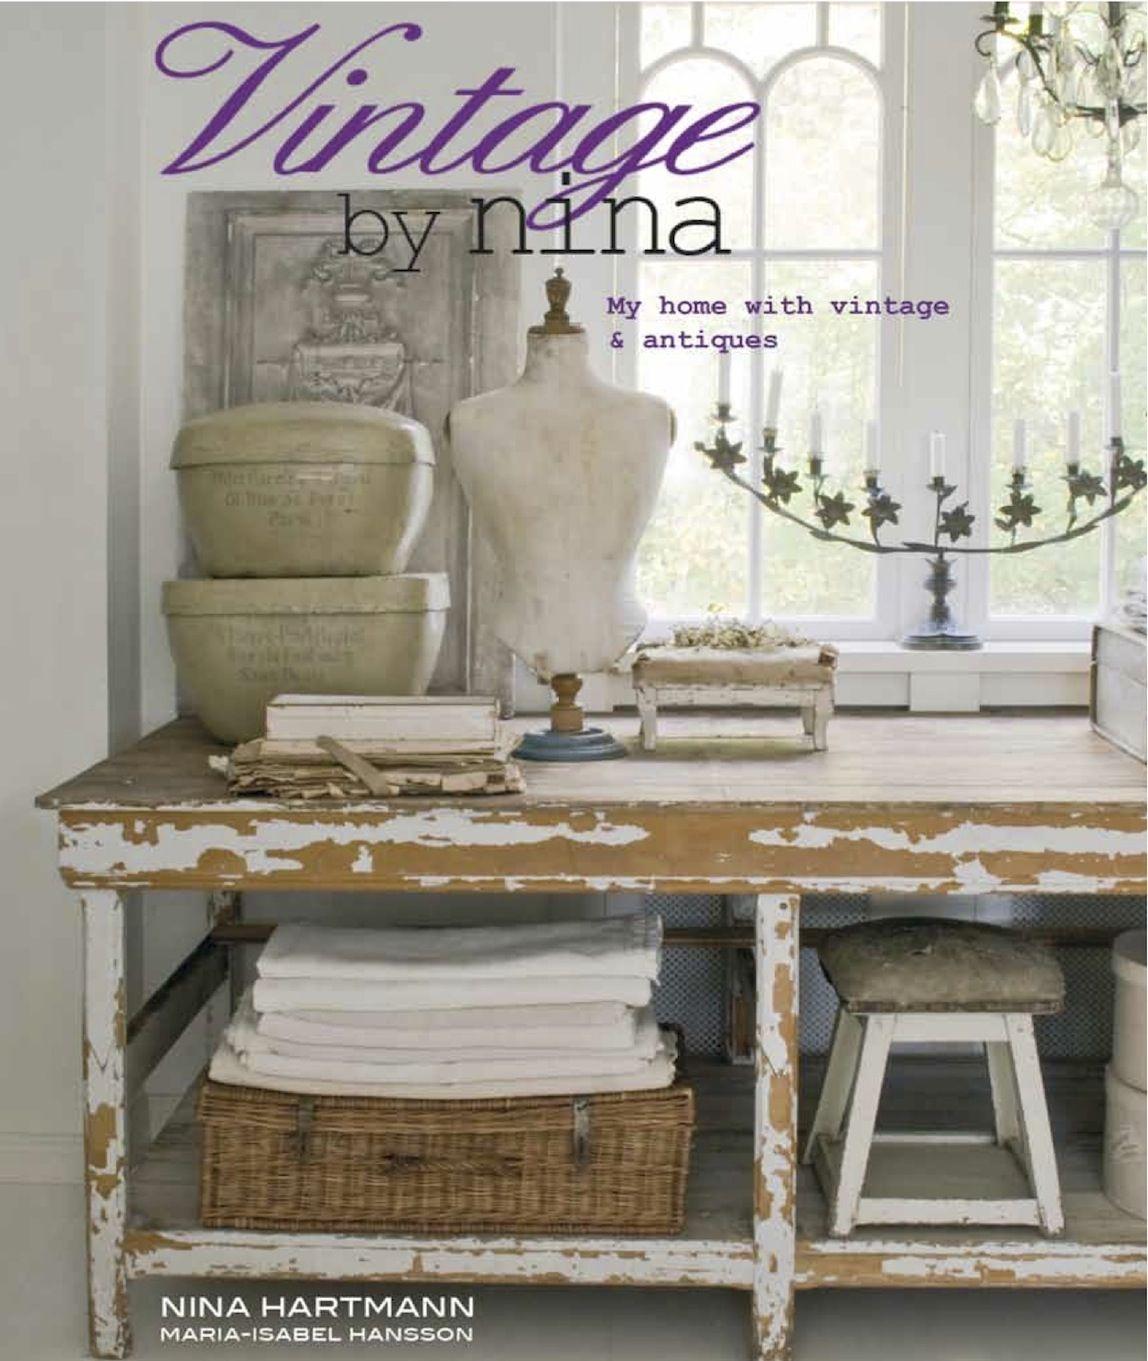 Vintage Interior Design Interior Design - Home interior design books